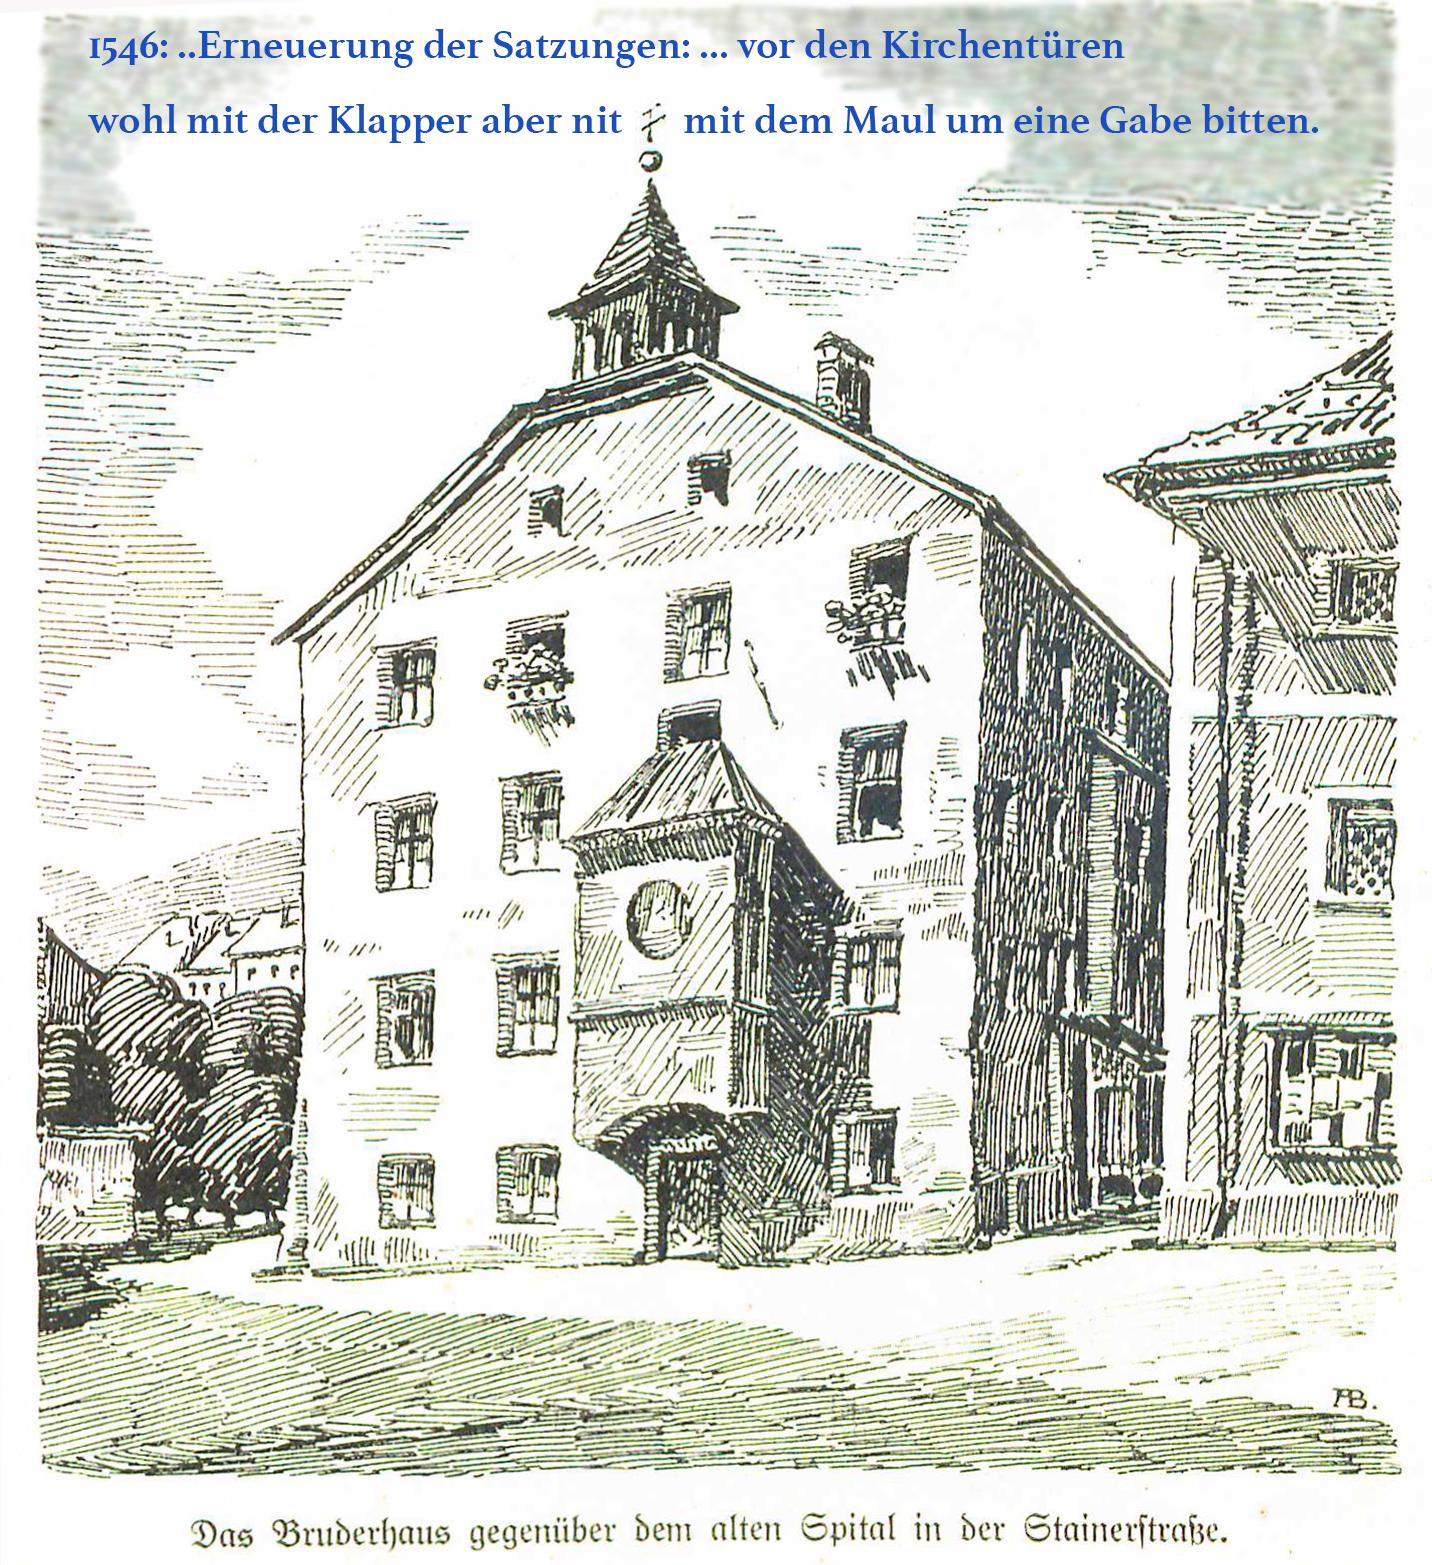 Bruderhaus Stainerstraße 1313